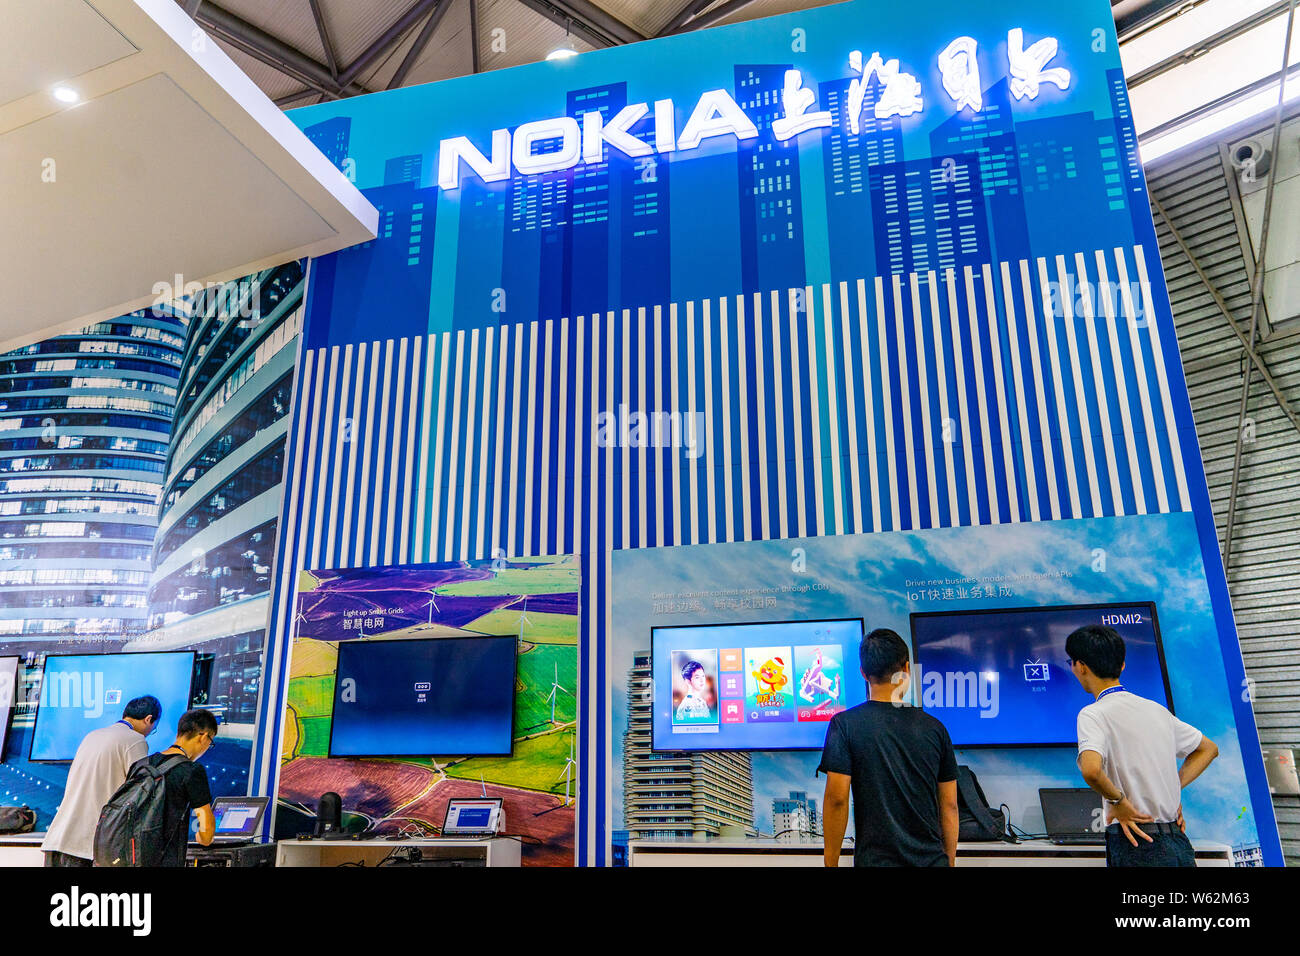 Nokia Smartphone Stock Photos & Nokia Smartphone Stock